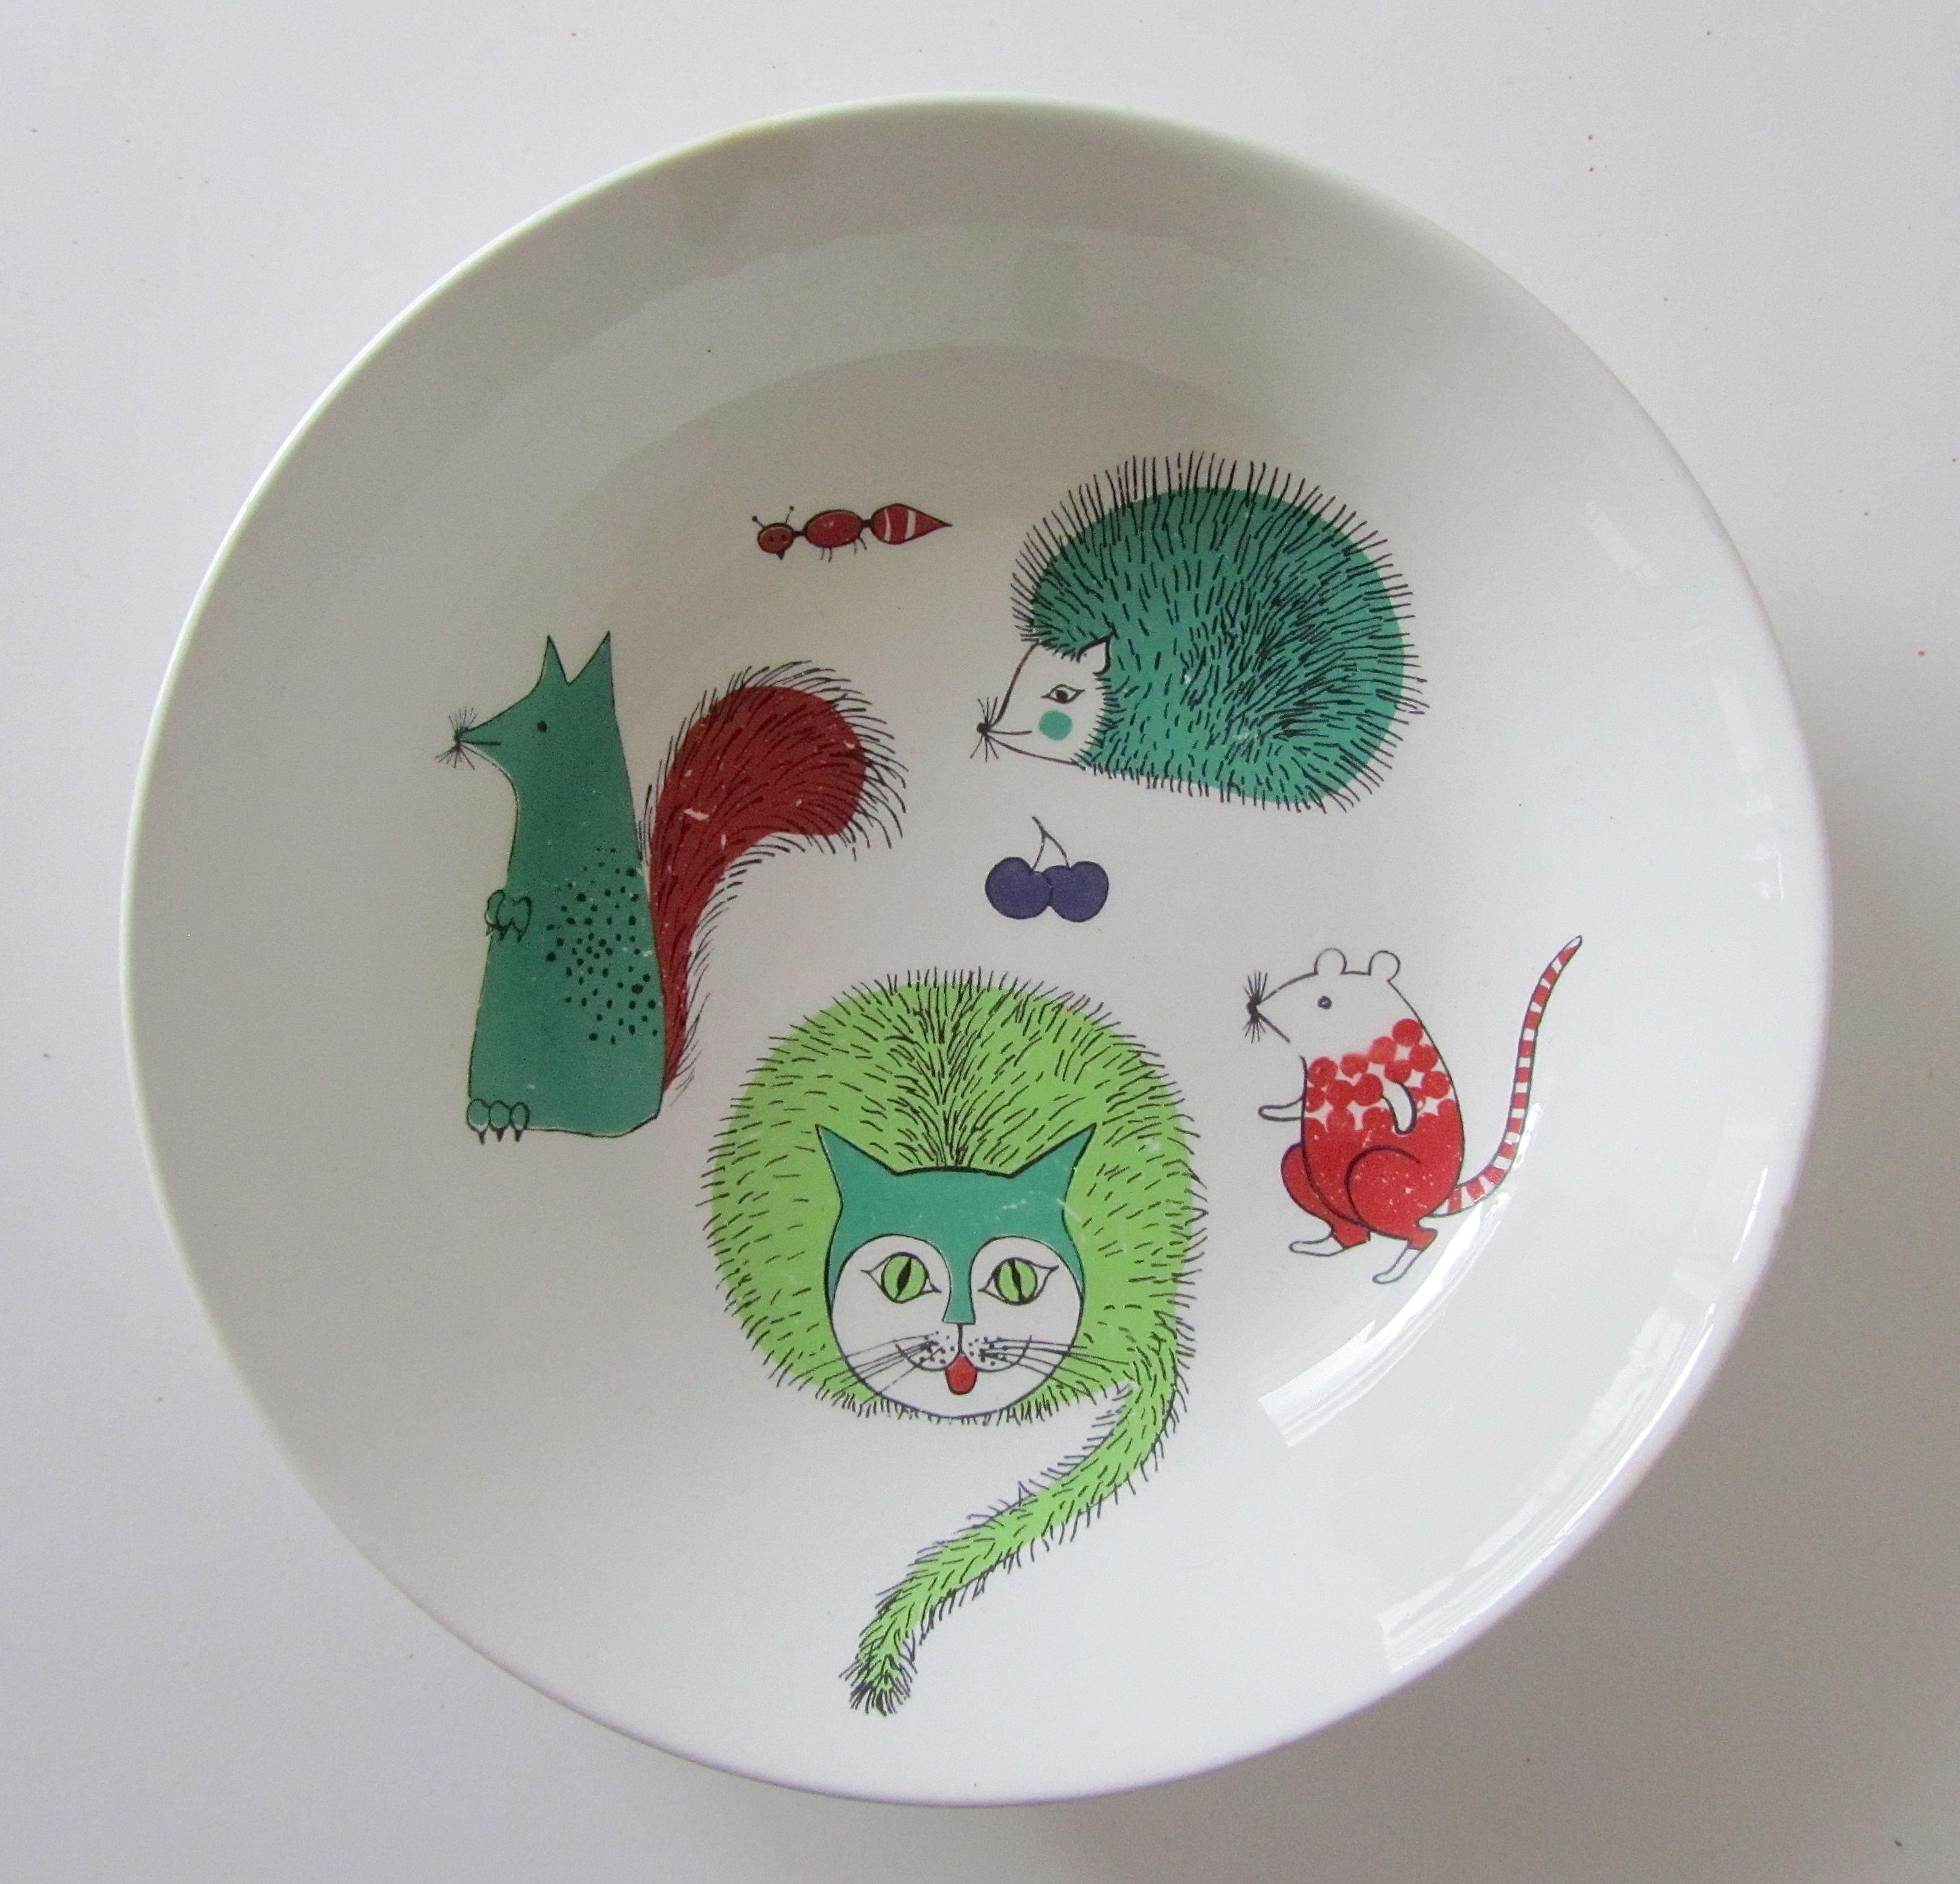 Pin By Tuuli Roth On Retro Romu Creative Kids Plates Creative